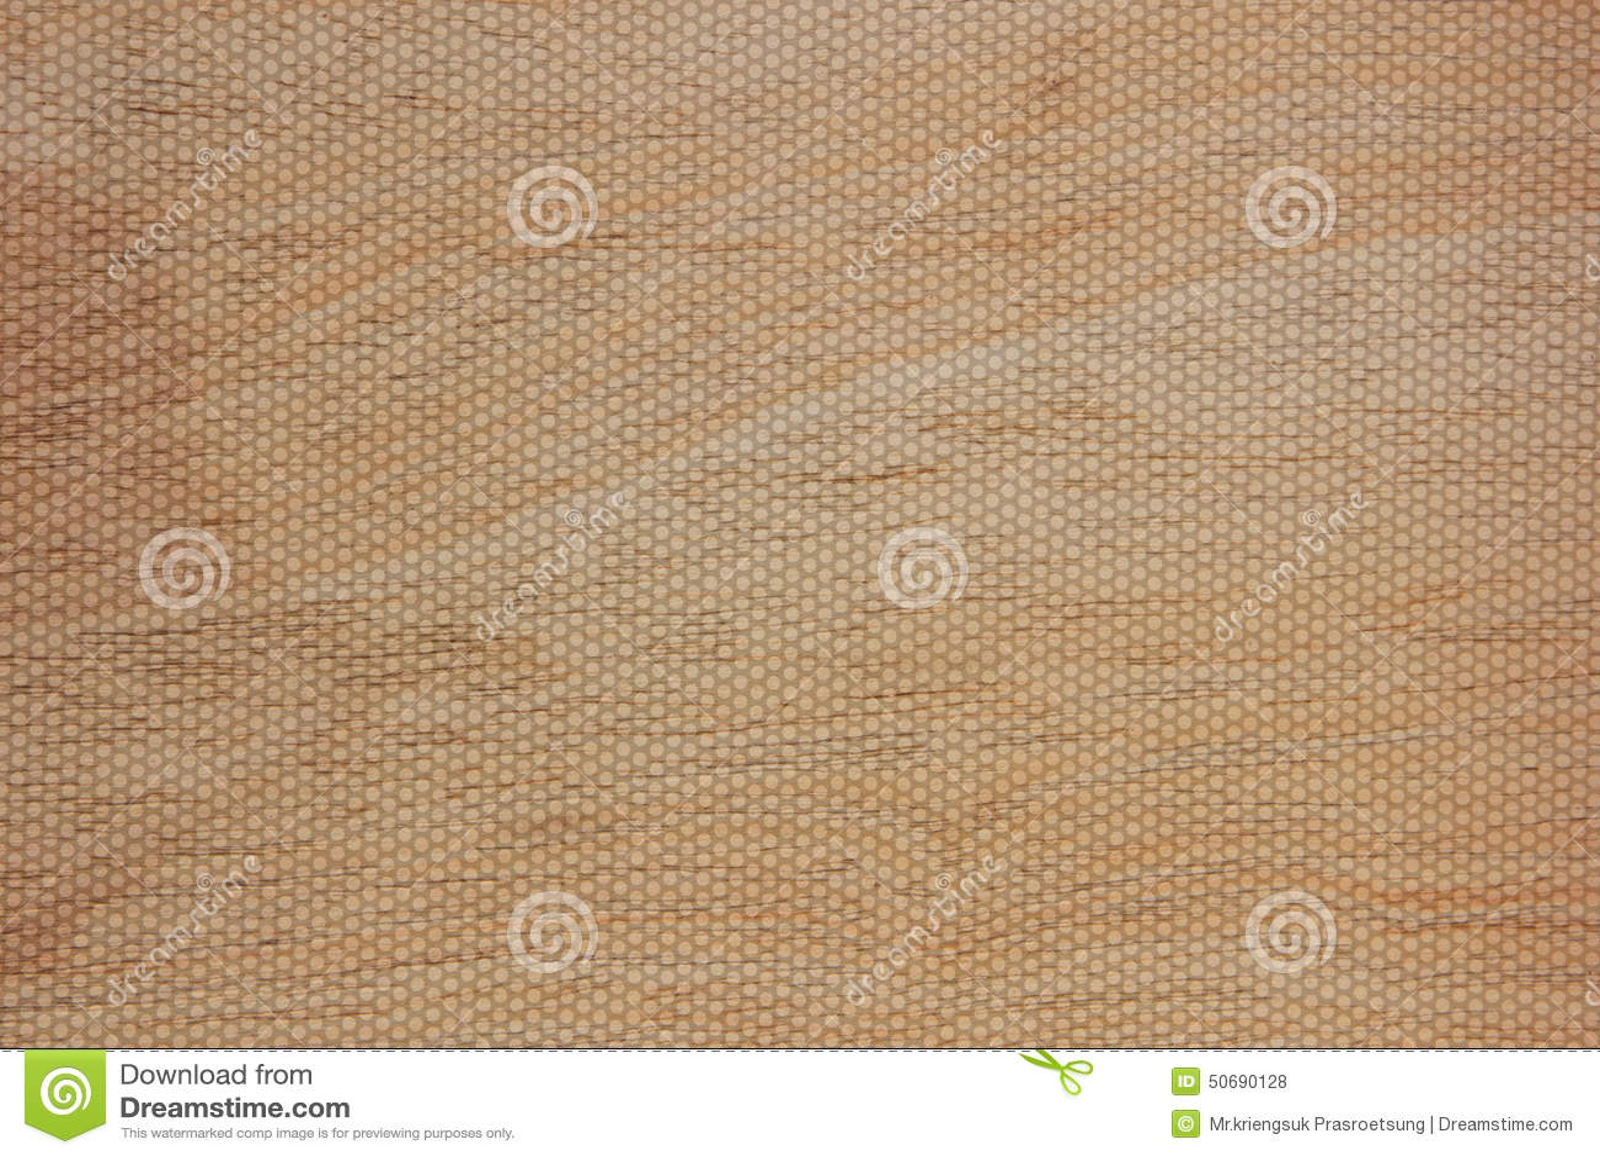 Download 木背景 库存照片. 图片 包括有 嗜好, 建筑, 日志, 板条, 背包, 木材, 农村, 纹理, 干燥, 放光 - 50690128